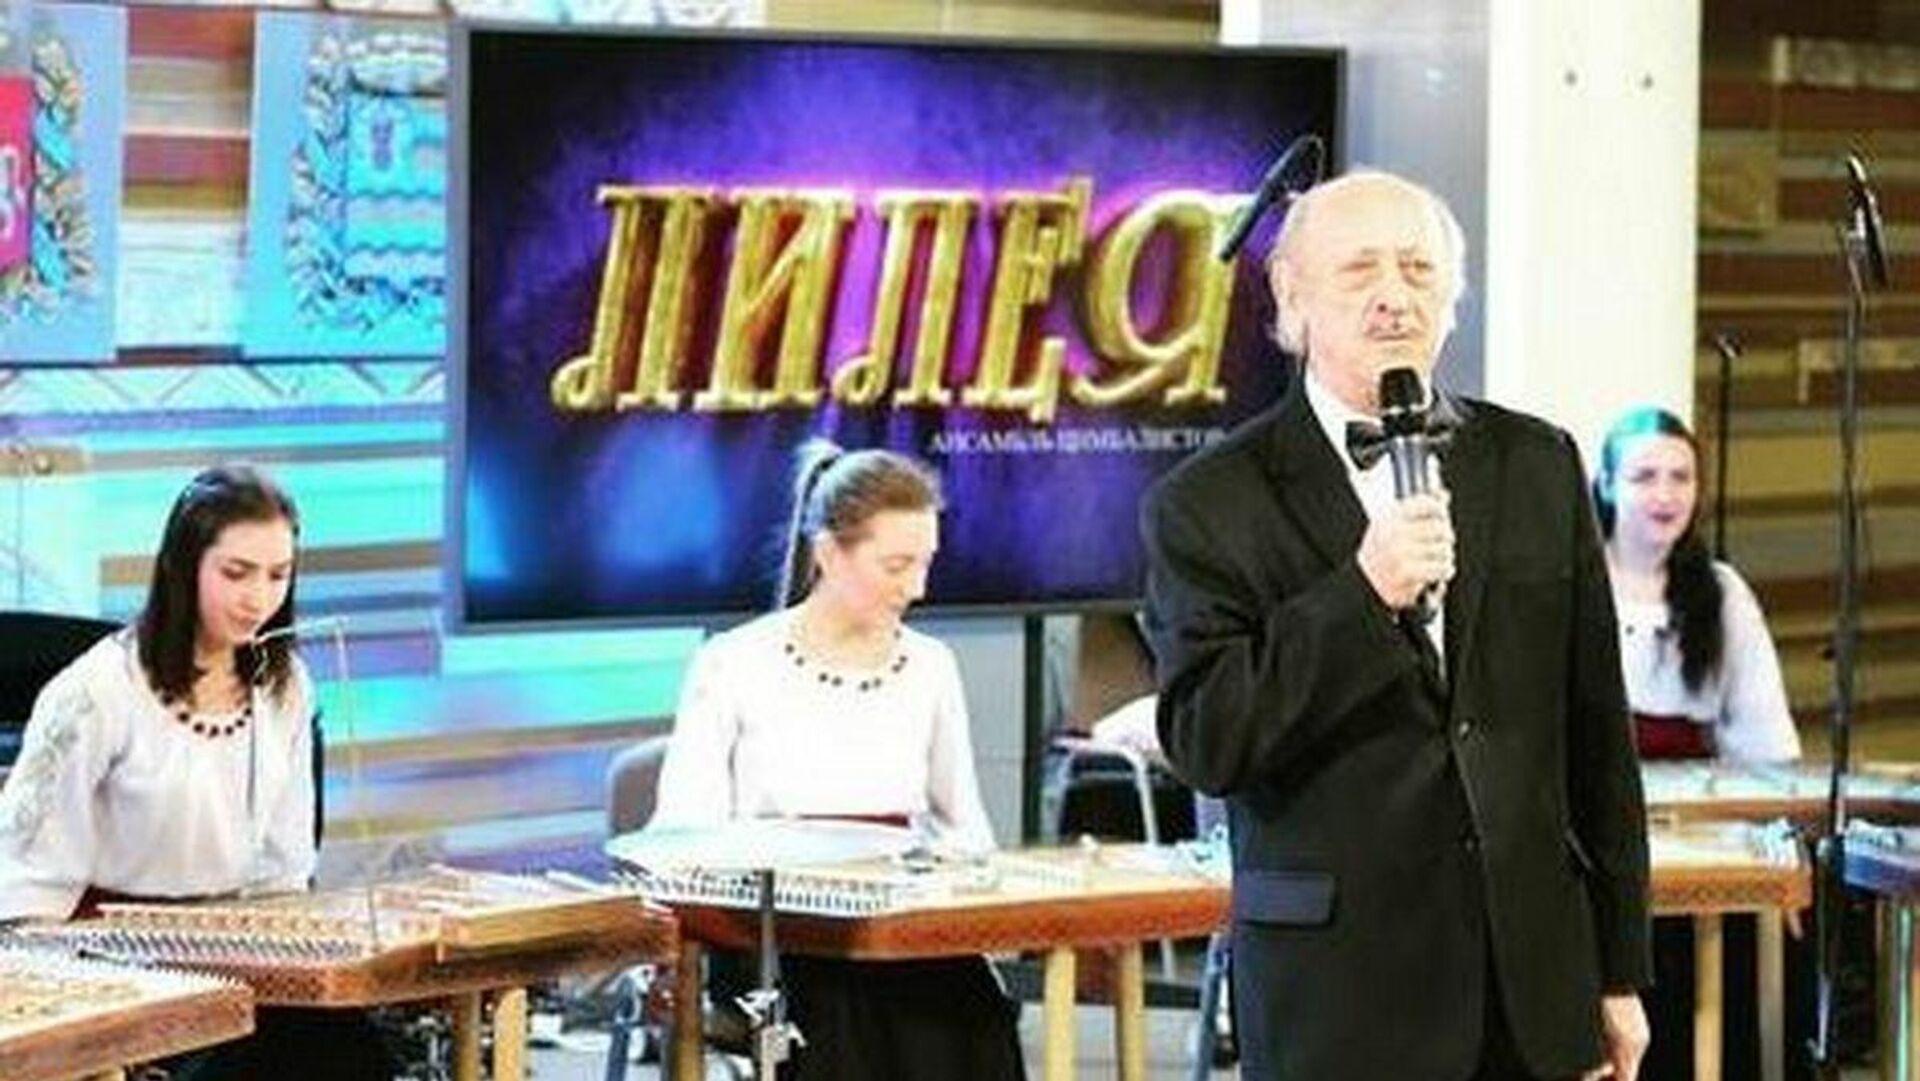 Ансамбль цимбалистов Лилея - Sputnik Беларусь, 1920, 11.10.2021